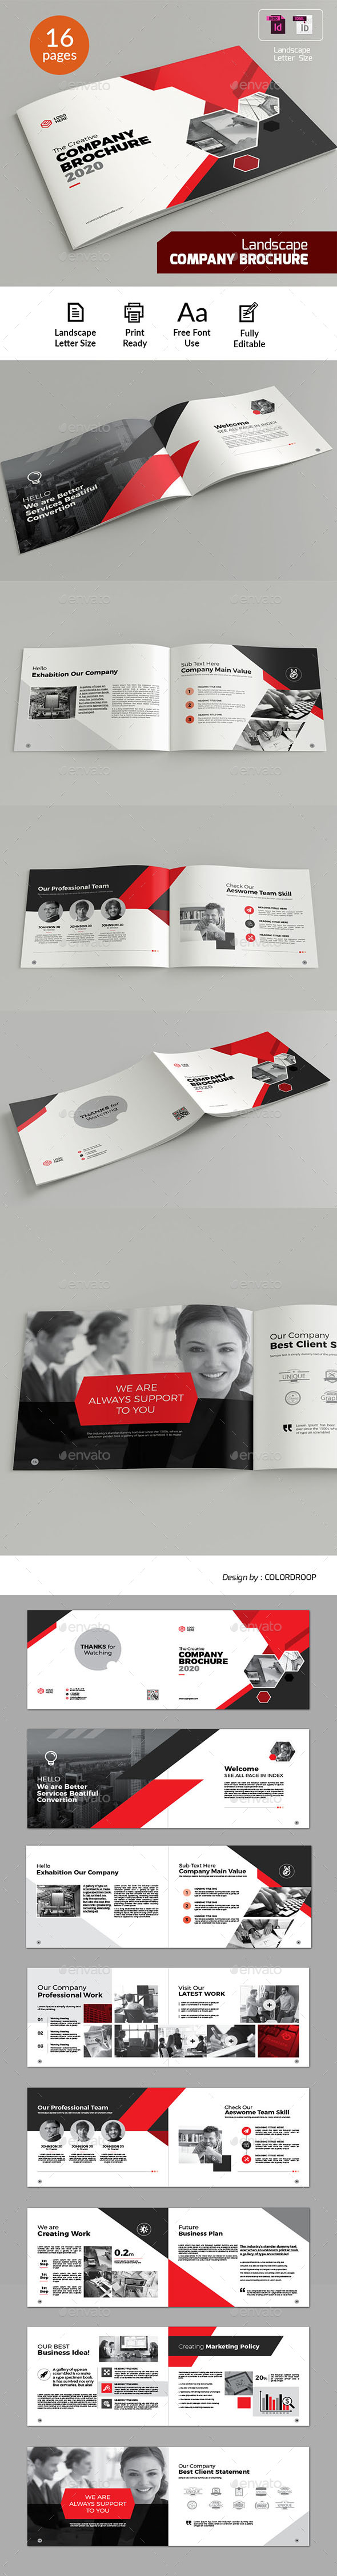 Landscape Company Brochure - Corporate Brochures